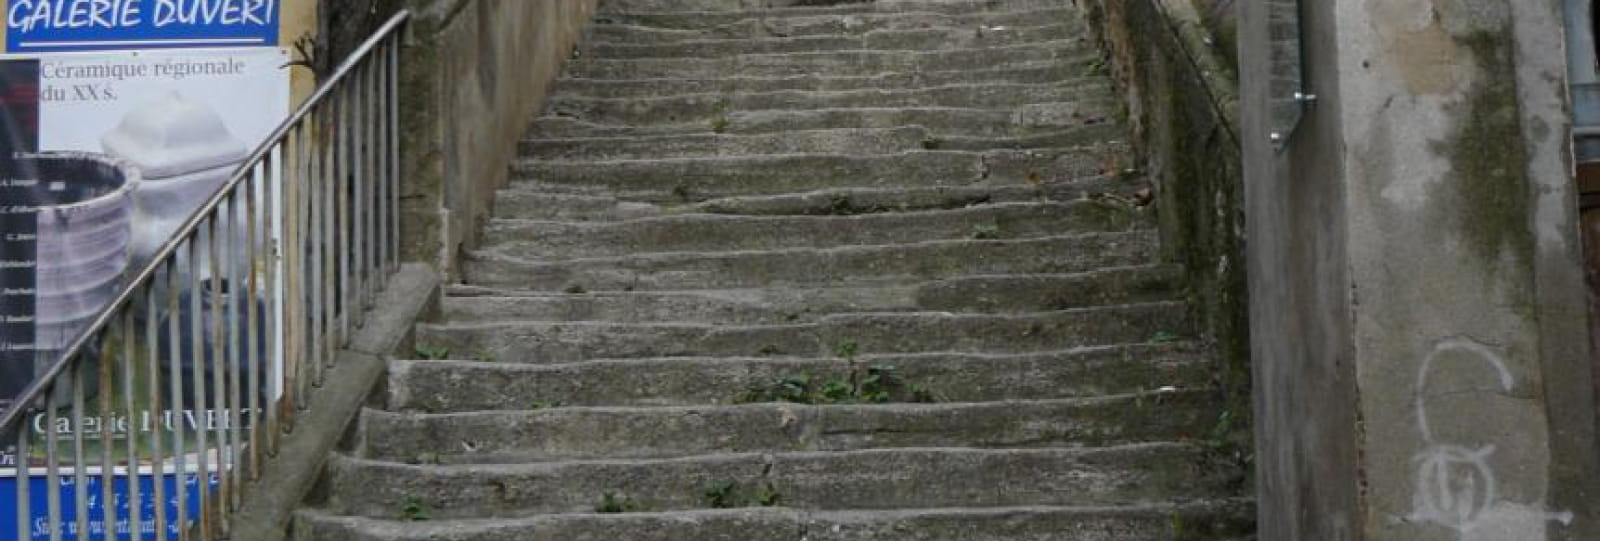 Escalier des Cordeliers